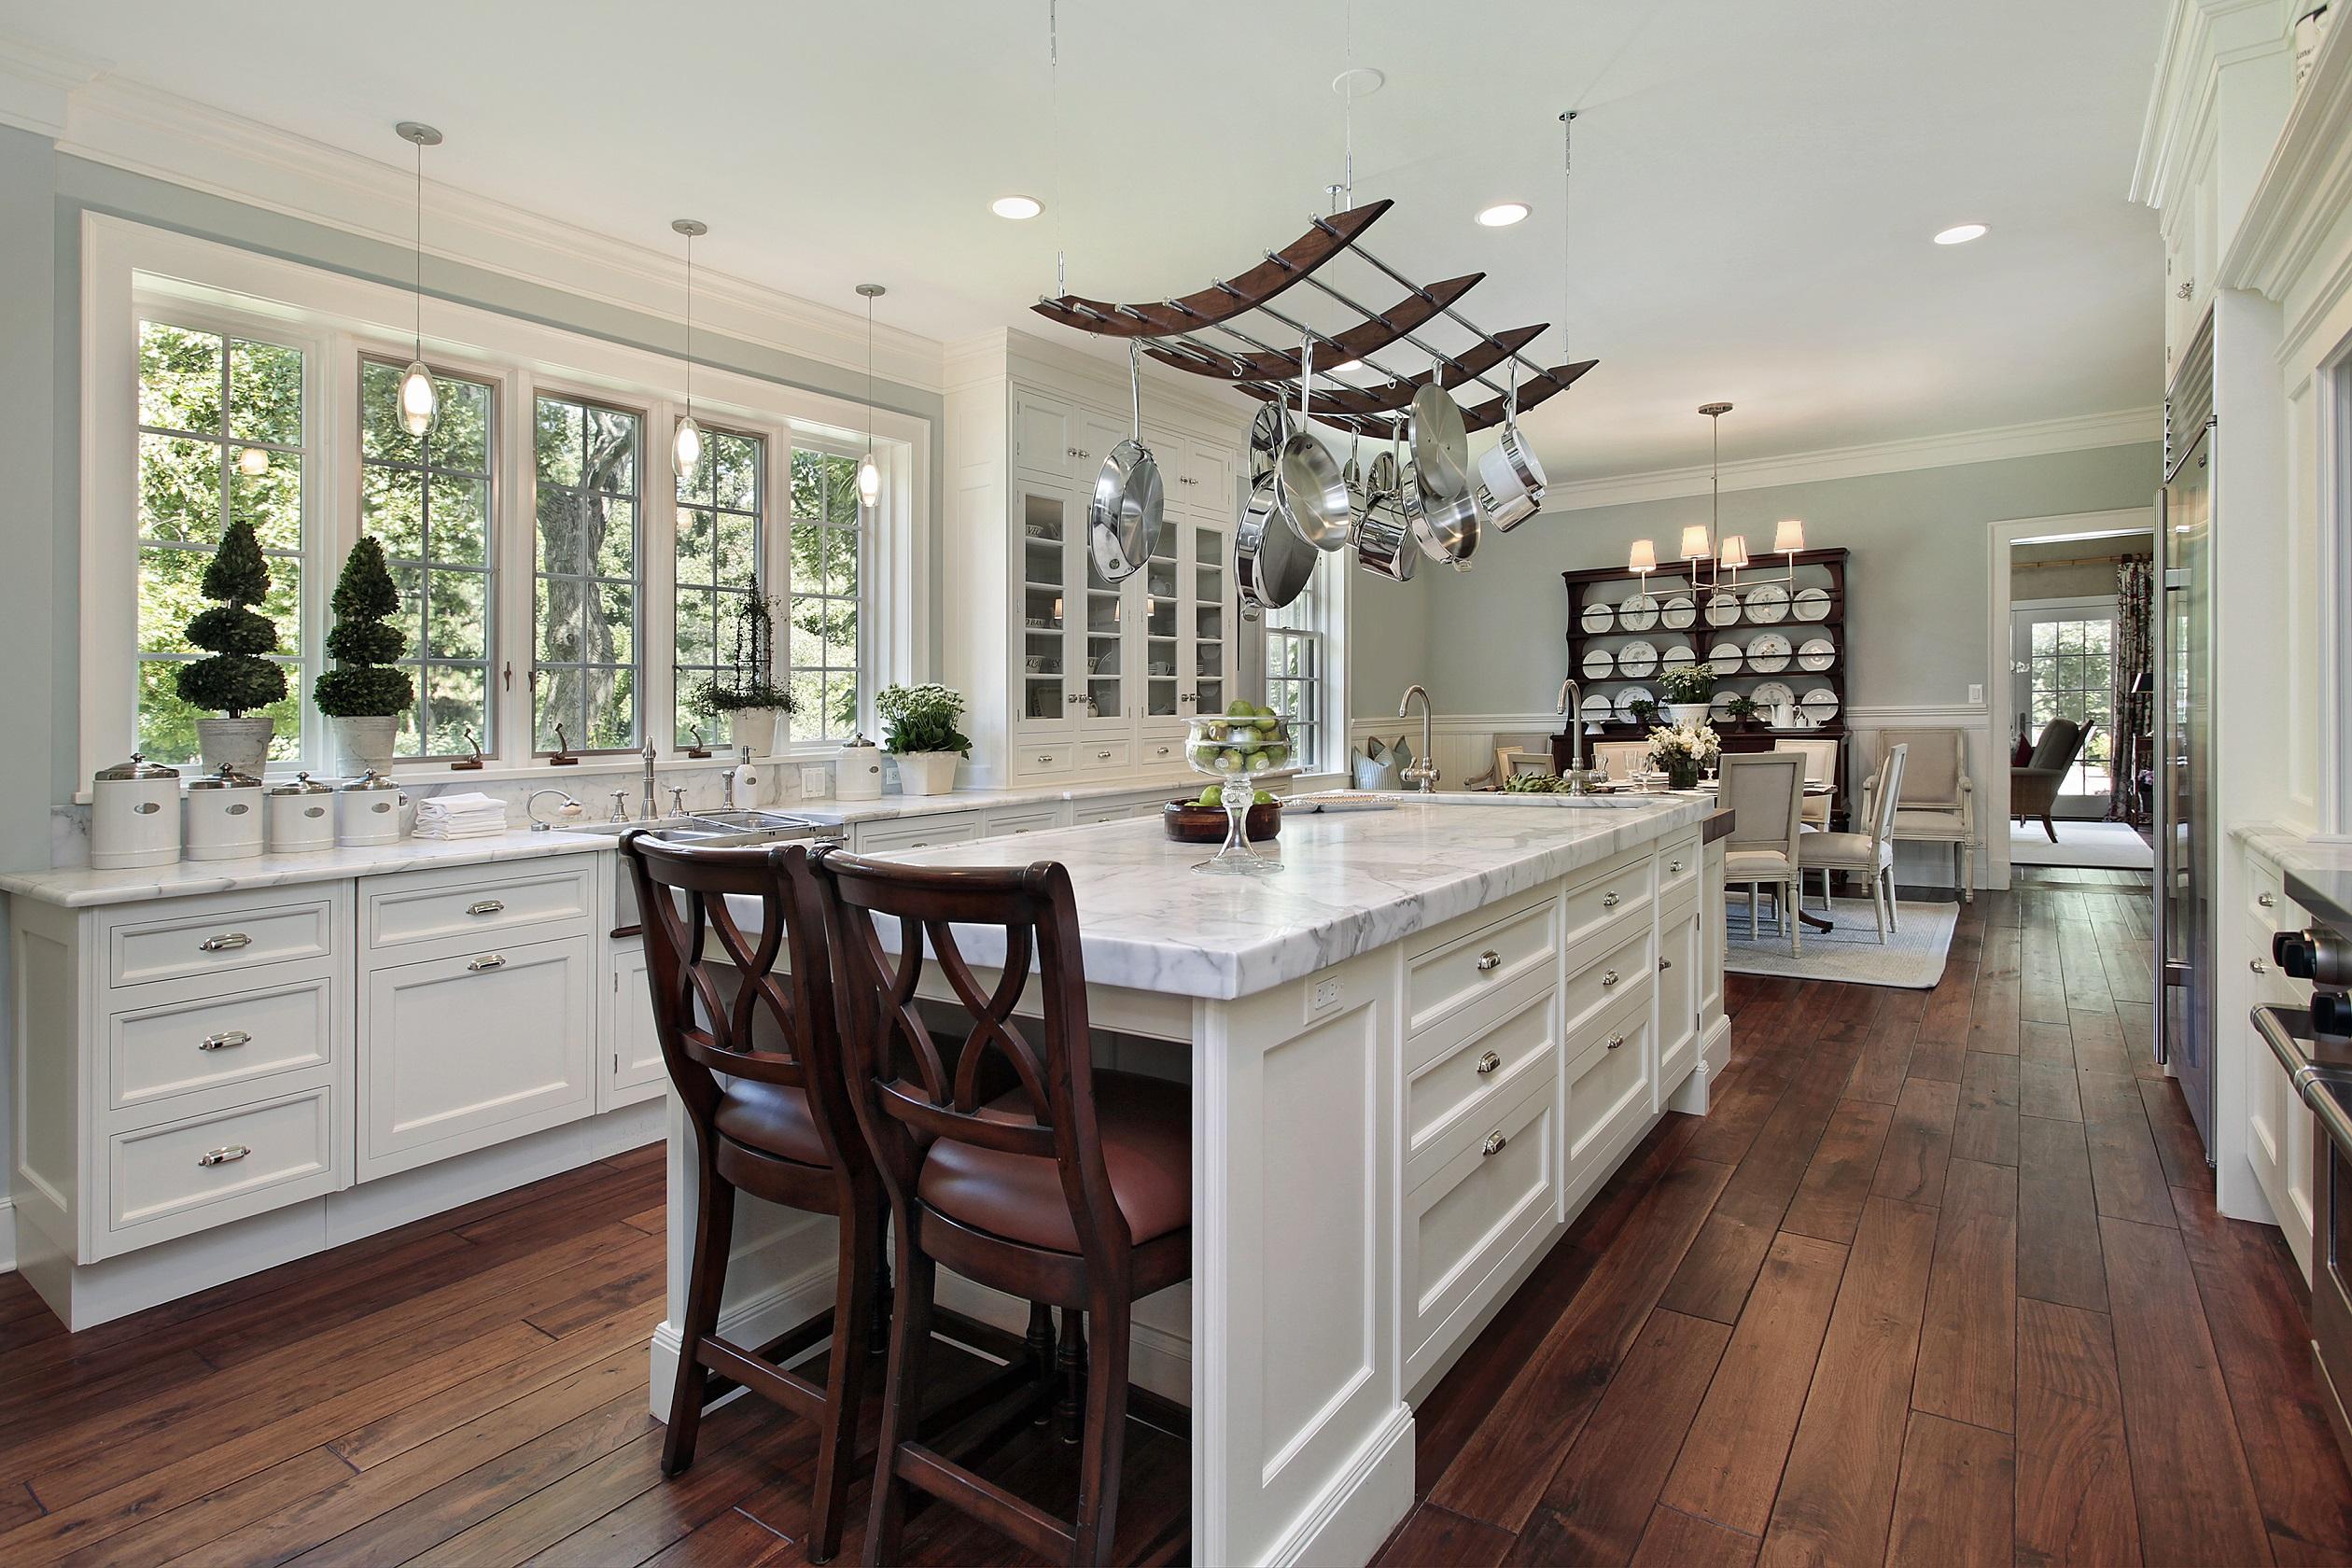 2017 Kitchens trend watch: 2017 kitchens | shorewest latest news – our blog